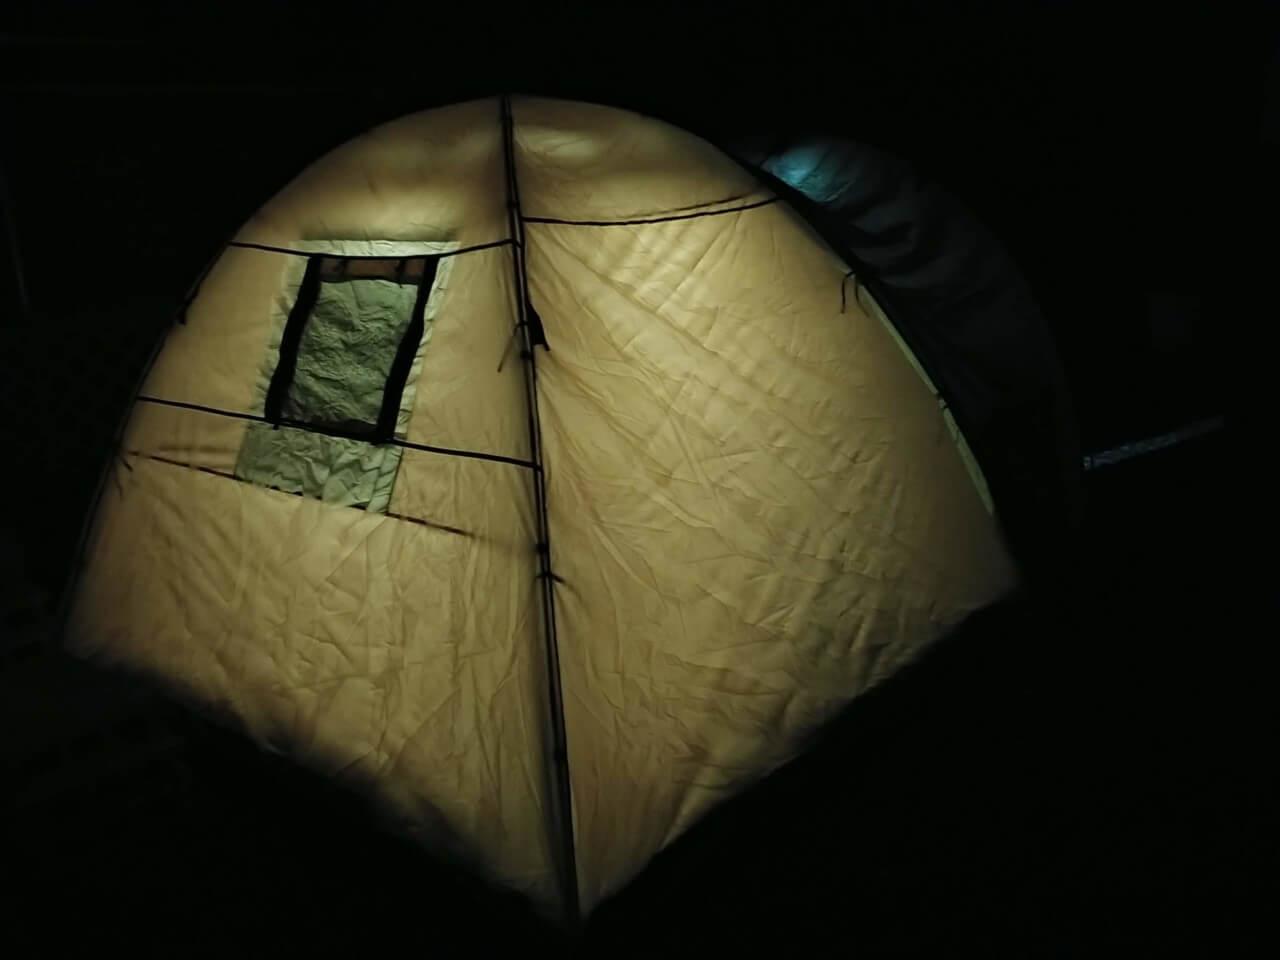 Hewflit(HillStone) オールインワンテントbigサイズ ツールームテント